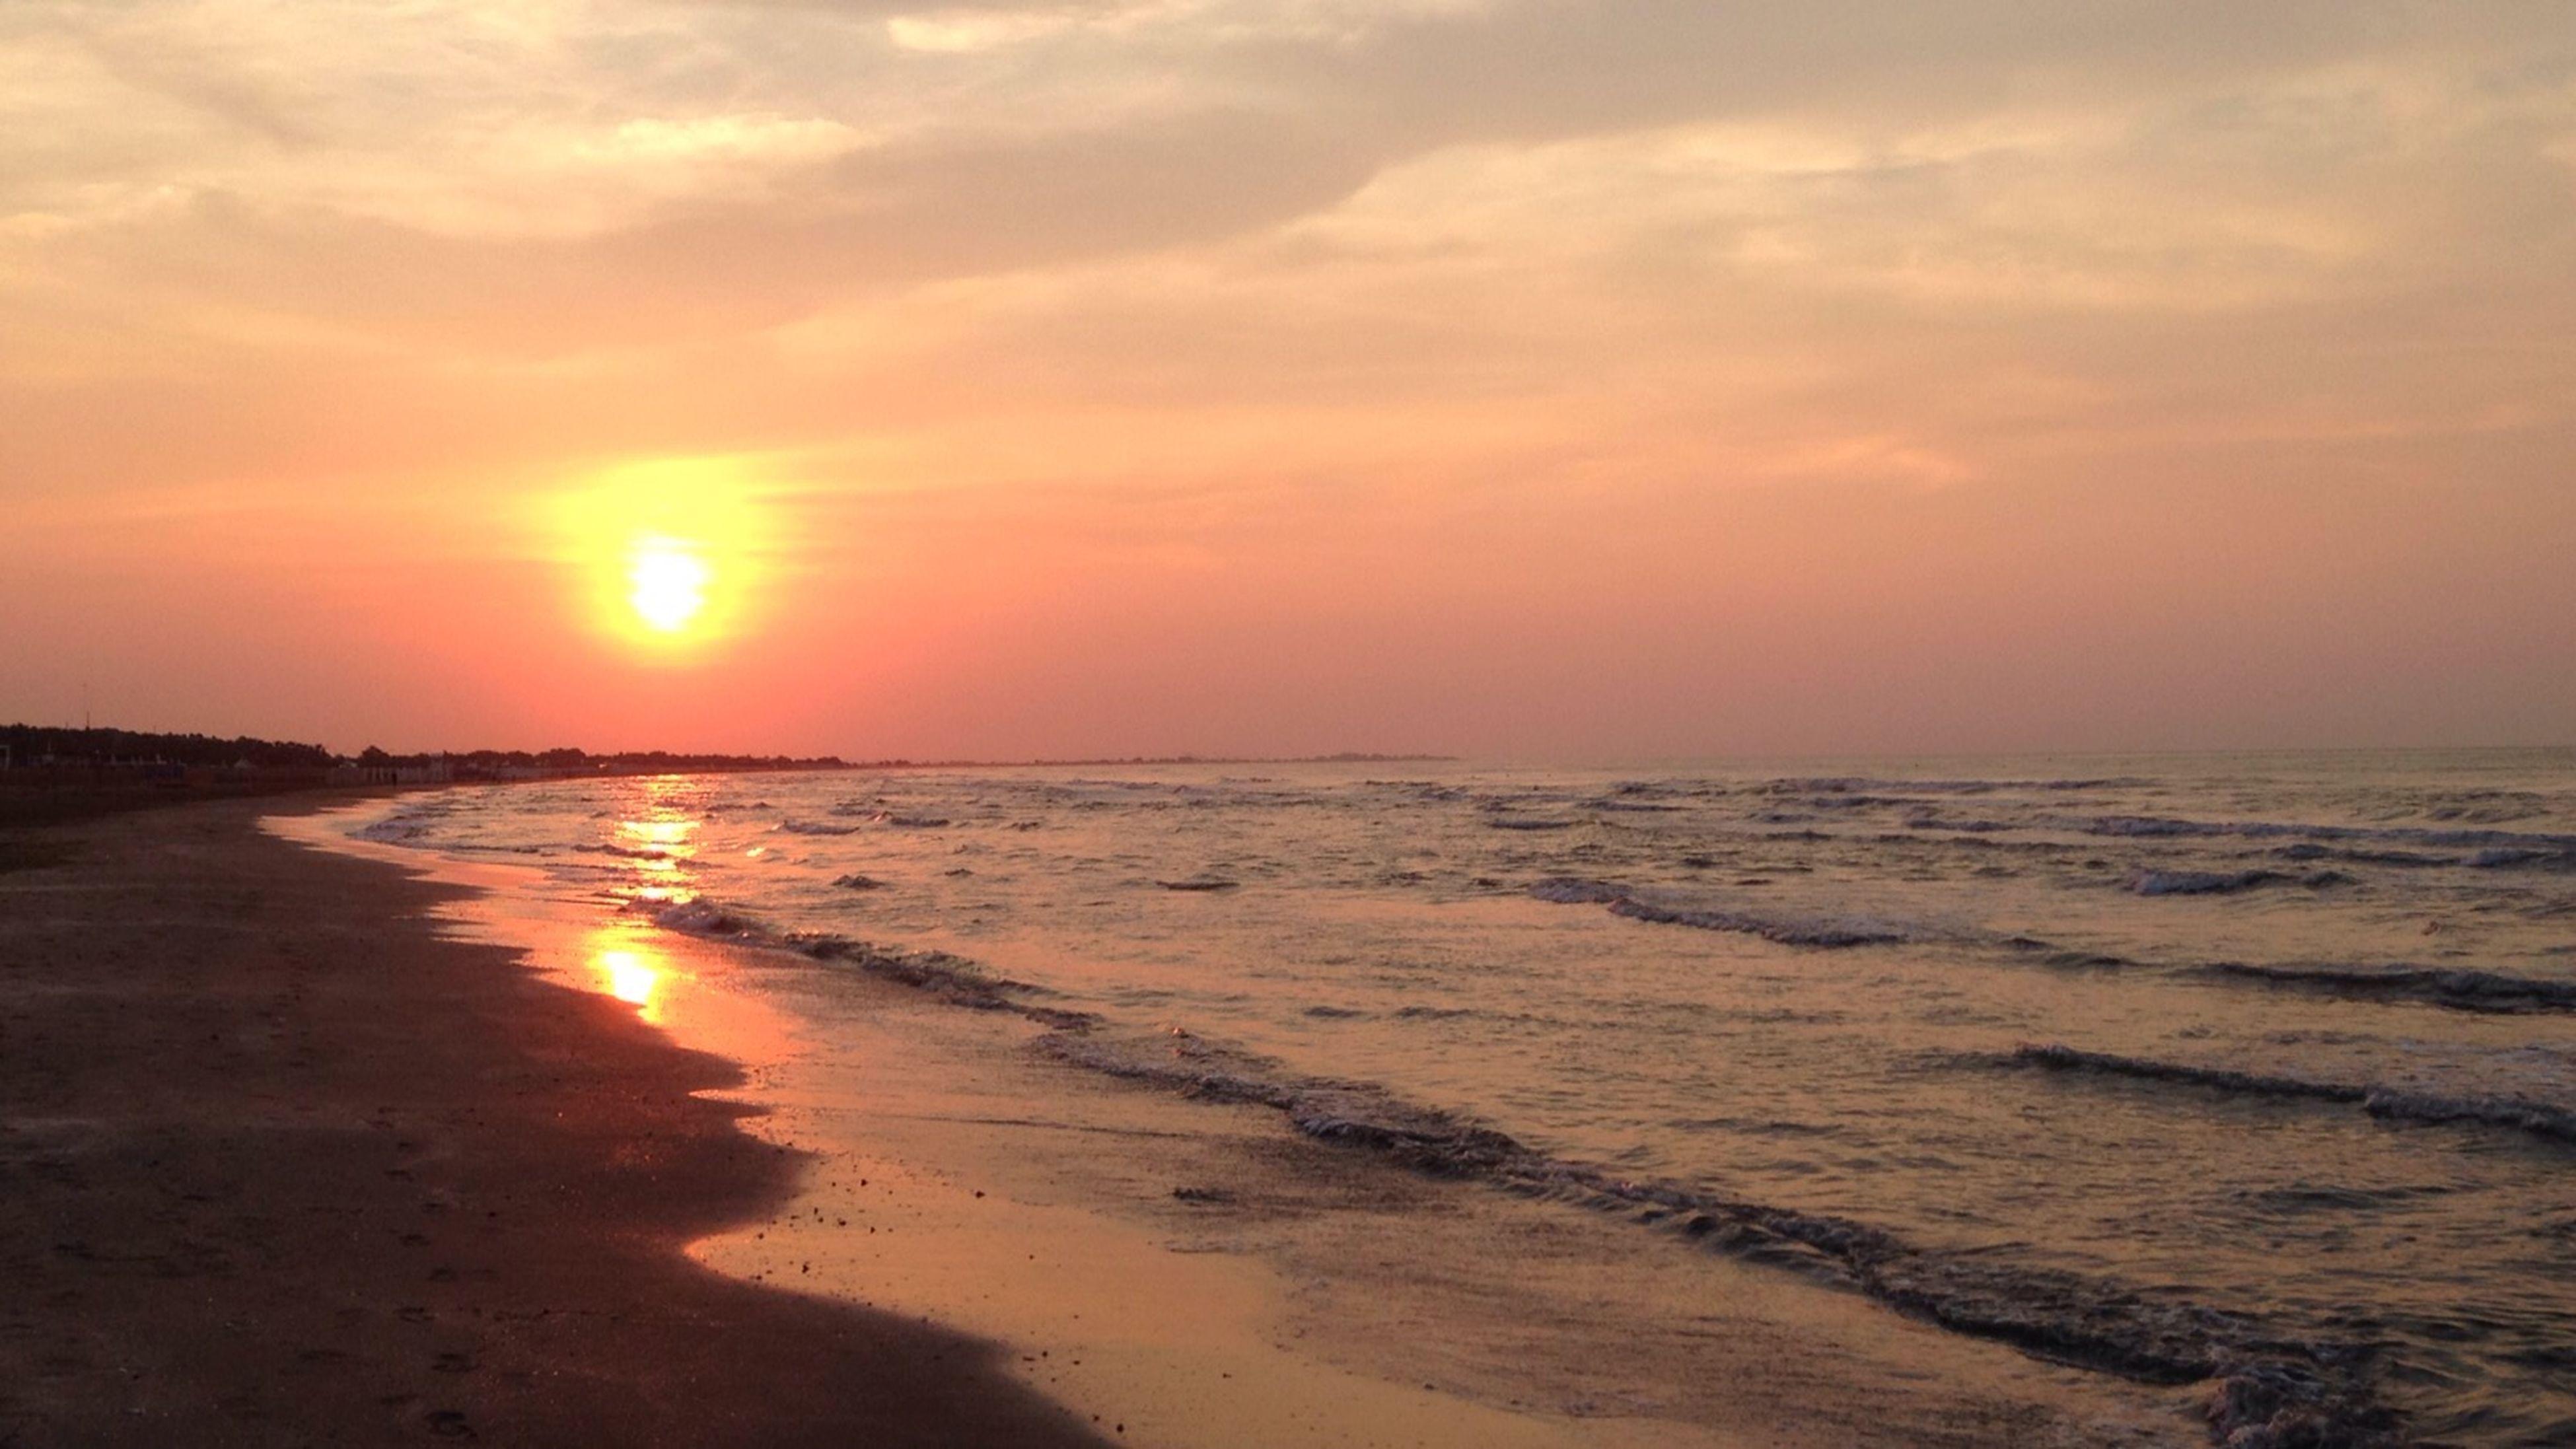 sea, sunset, beach, horizon over water, water, scenics, shore, tranquil scene, beauty in nature, tranquility, sand, sky, orange color, sun, idyllic, nature, wave, reflection, coastline, cloud - sky